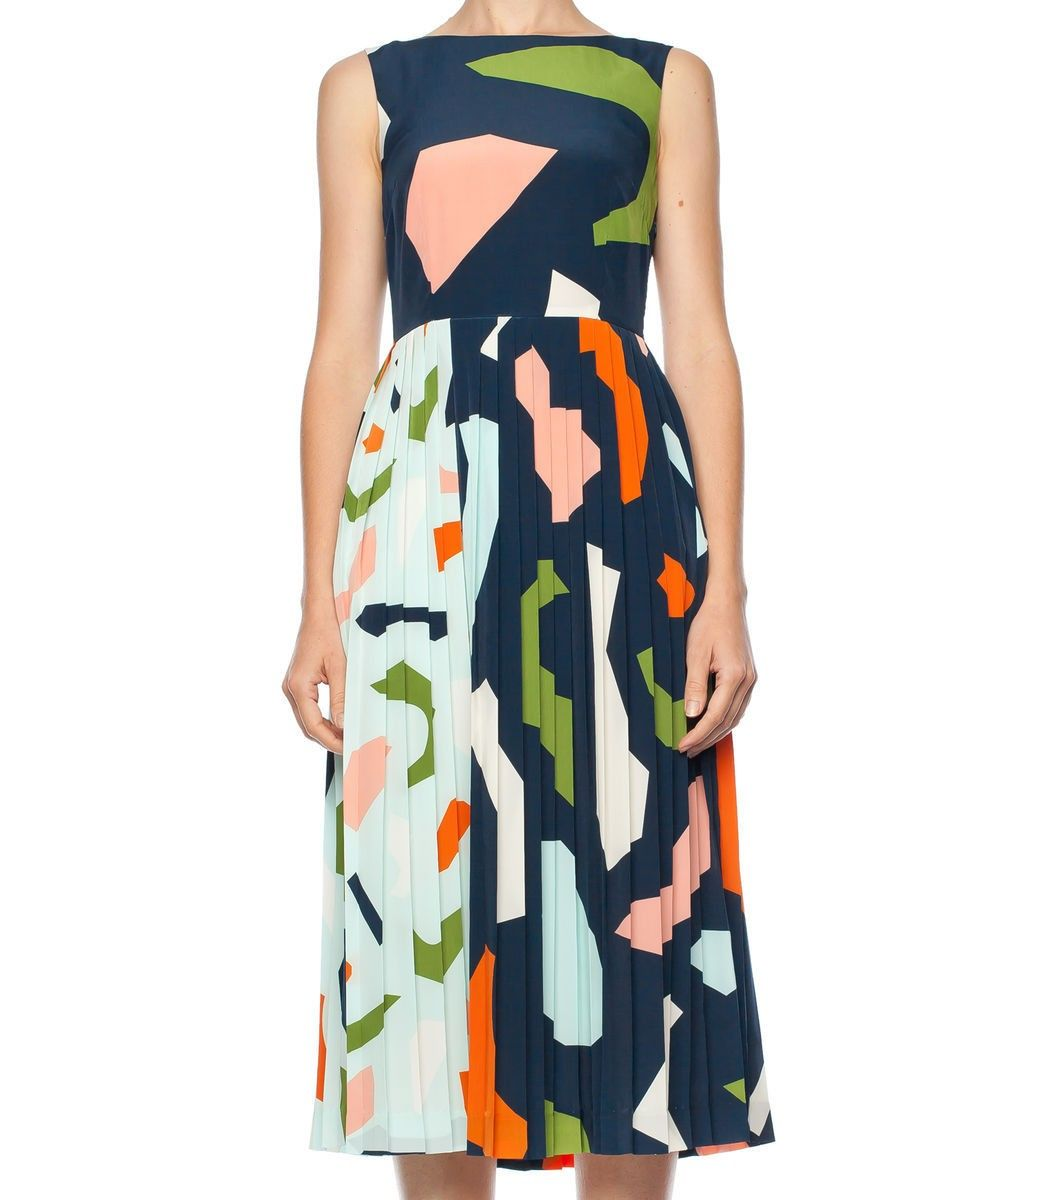 Gorman Online :: Jigsaw Pleat Dress - Dresses - Clothing